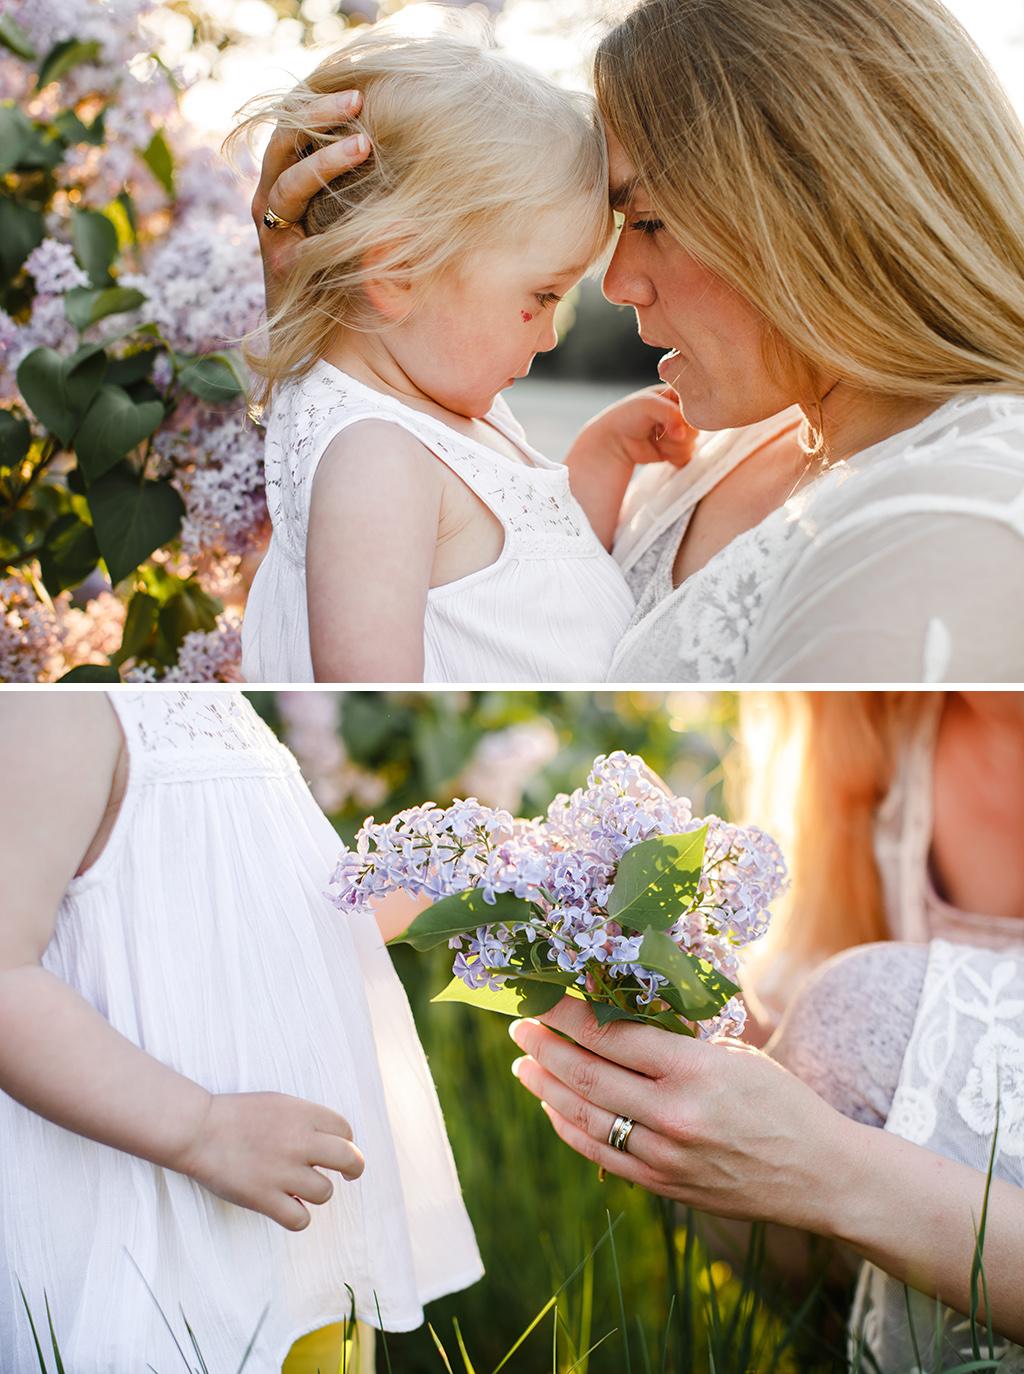 Familjefotograf_Stockholm_Syrener_familjefotografering_5.jpg